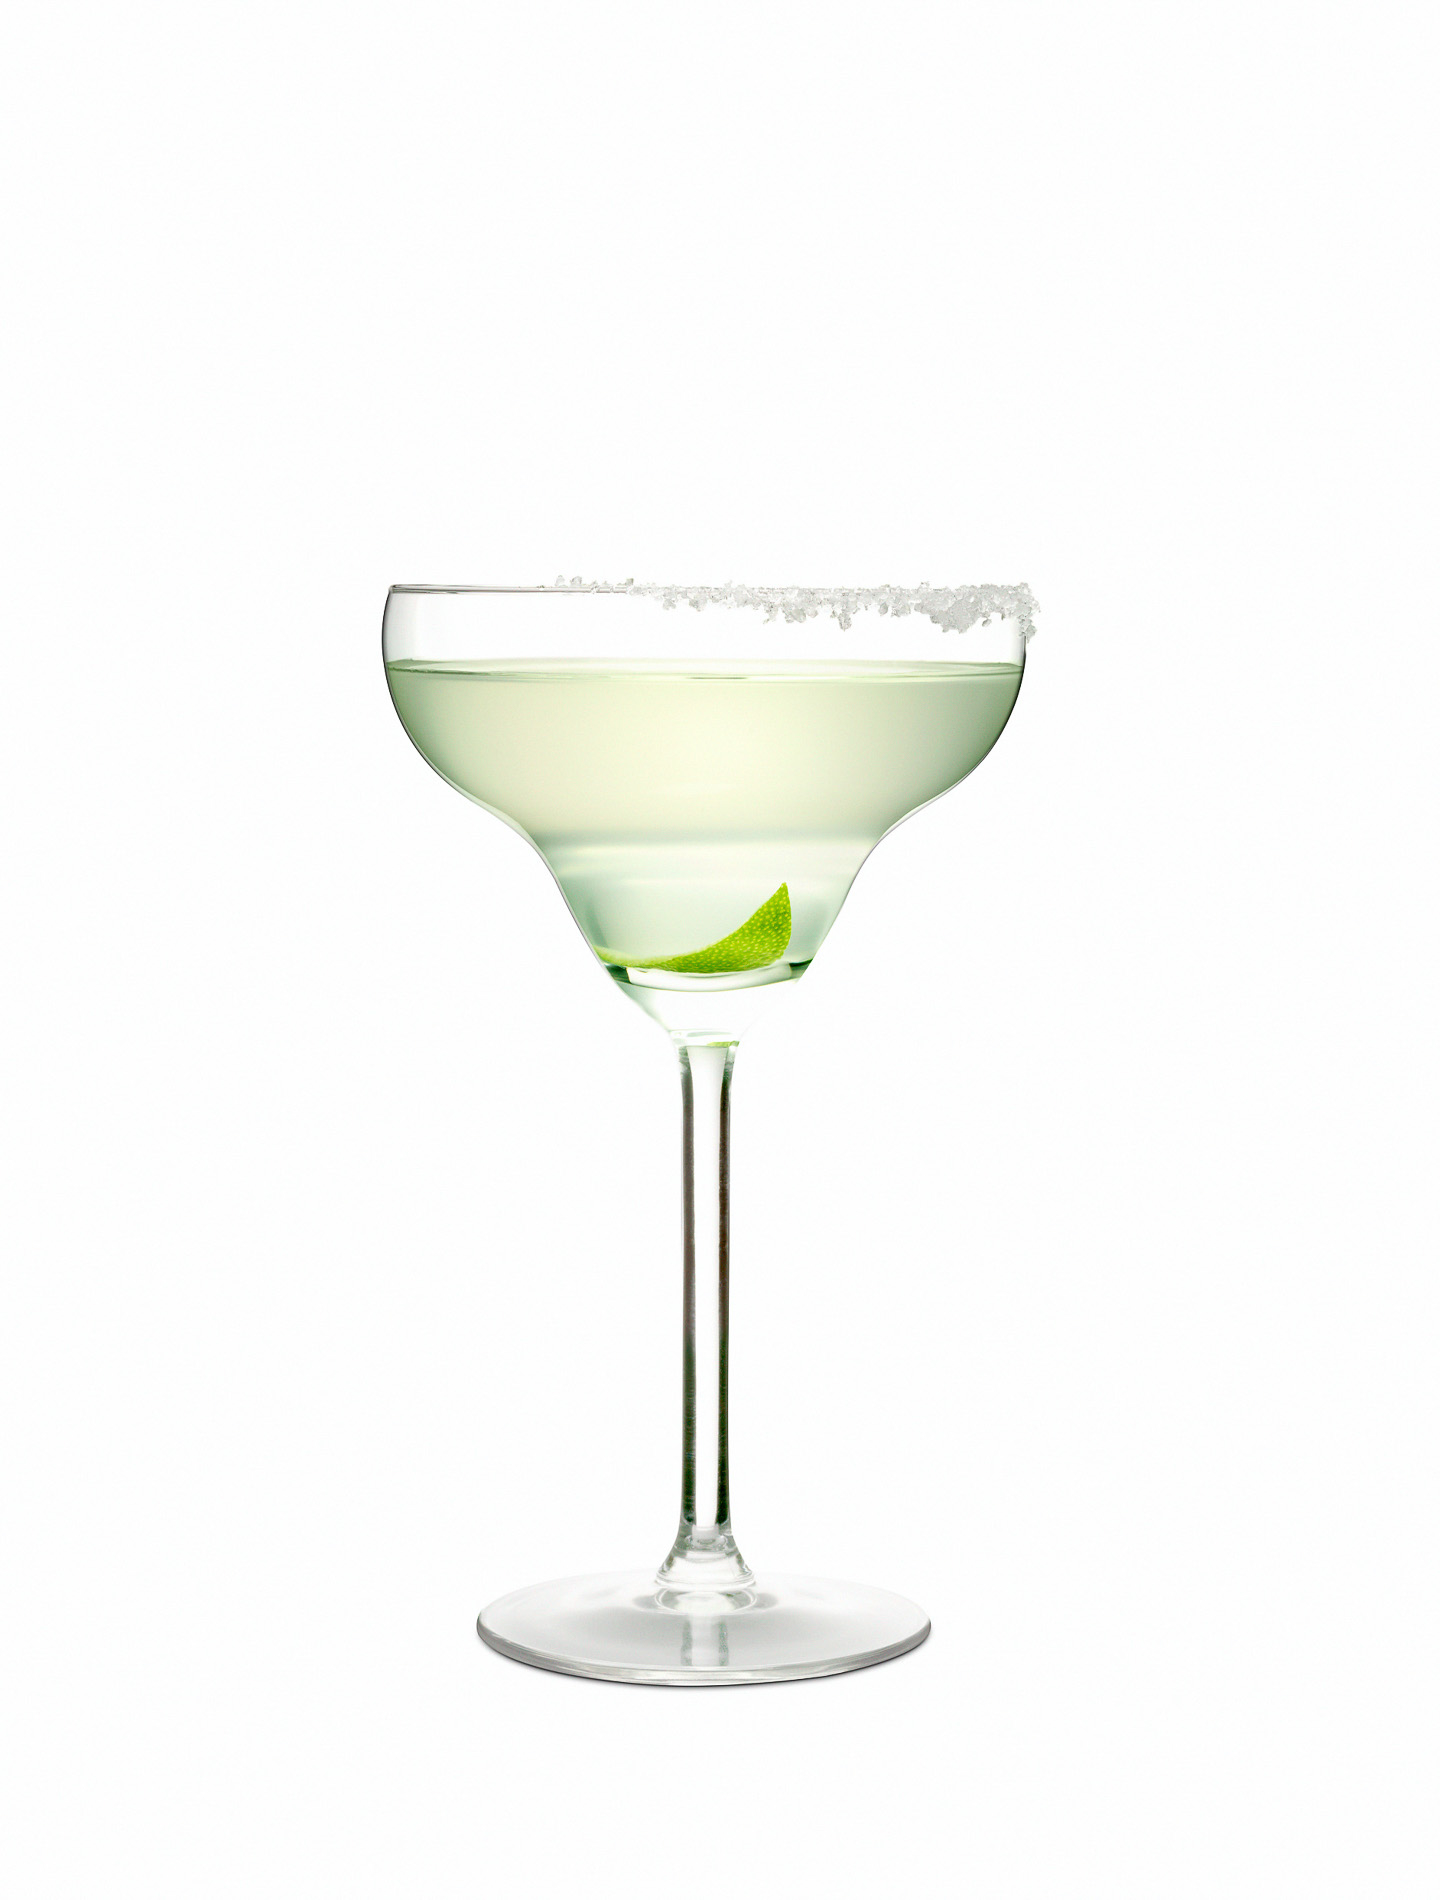 margarita cocktail in an elegant glass